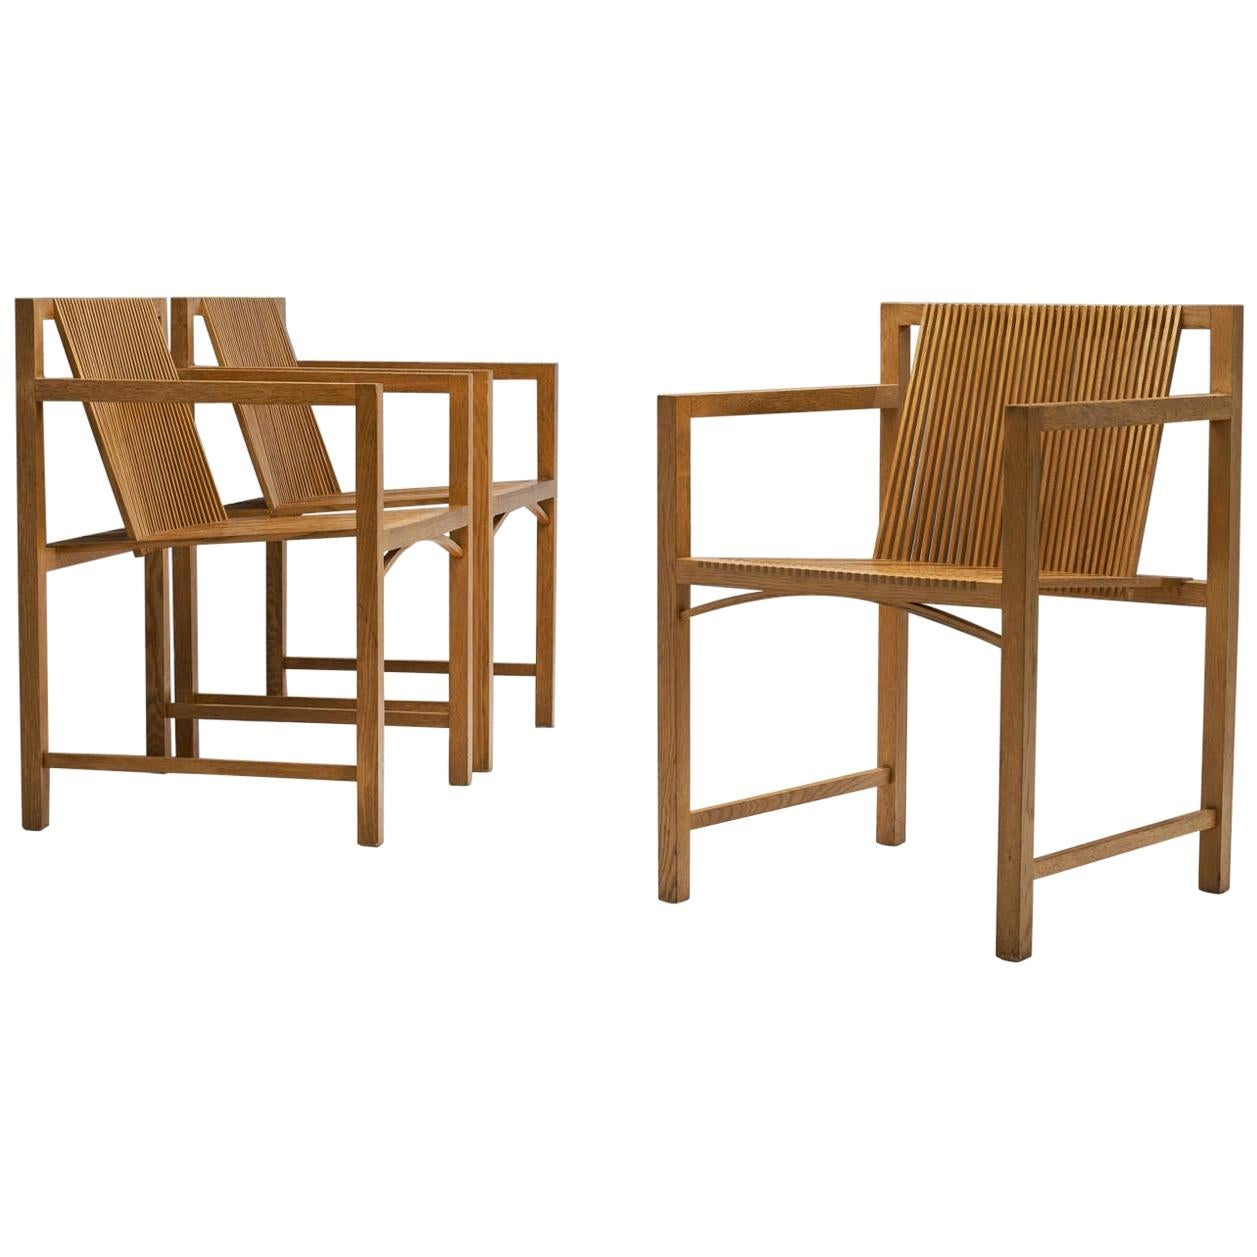 Set of Ruud-Jan Kokke Slat Chairs, the Netherlands, 1986